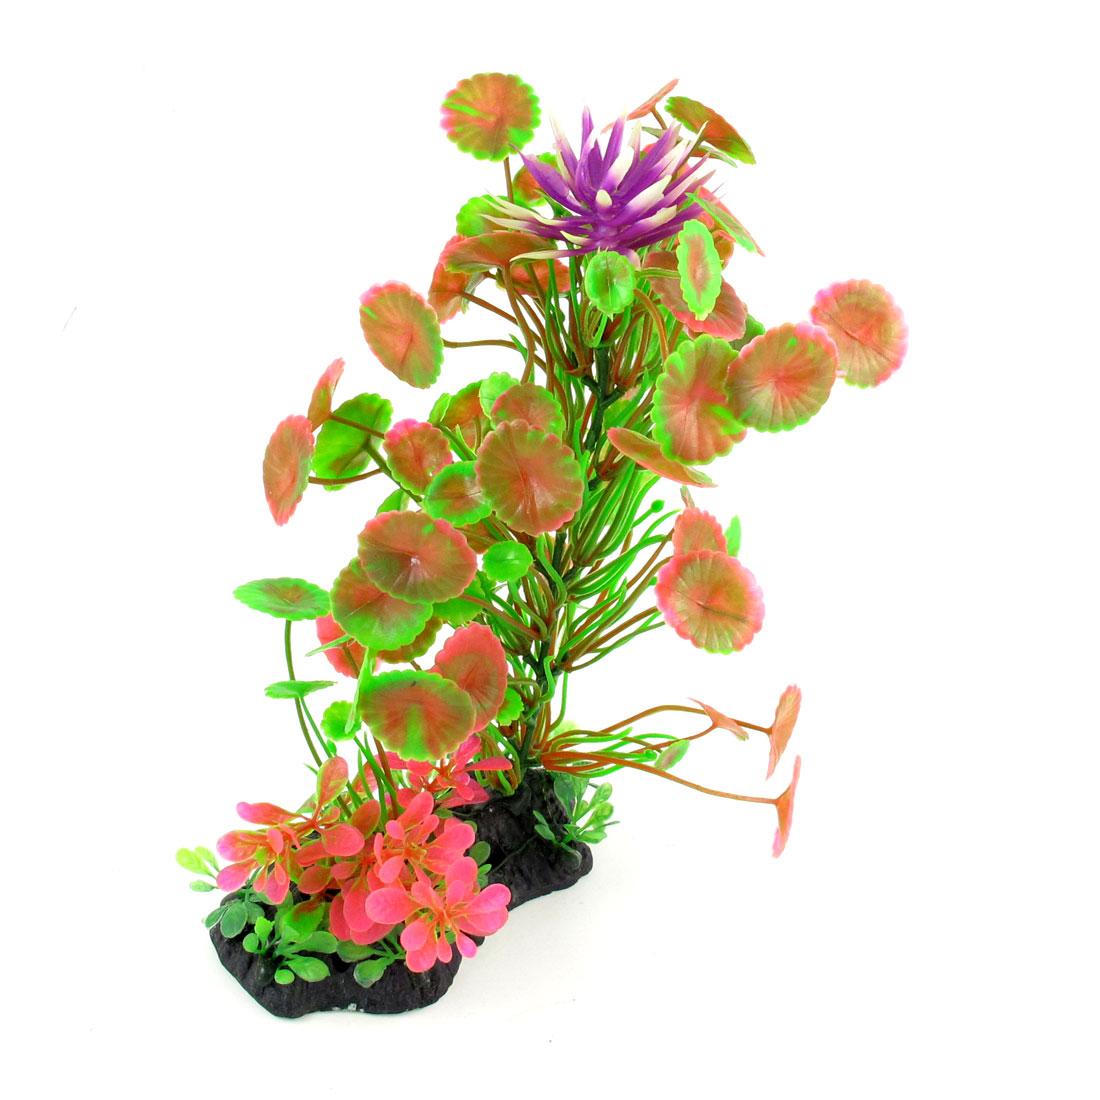 22cm High Manmade Aquatic Plastic Grass Plant Green Pink for Fish Tank Aquarium